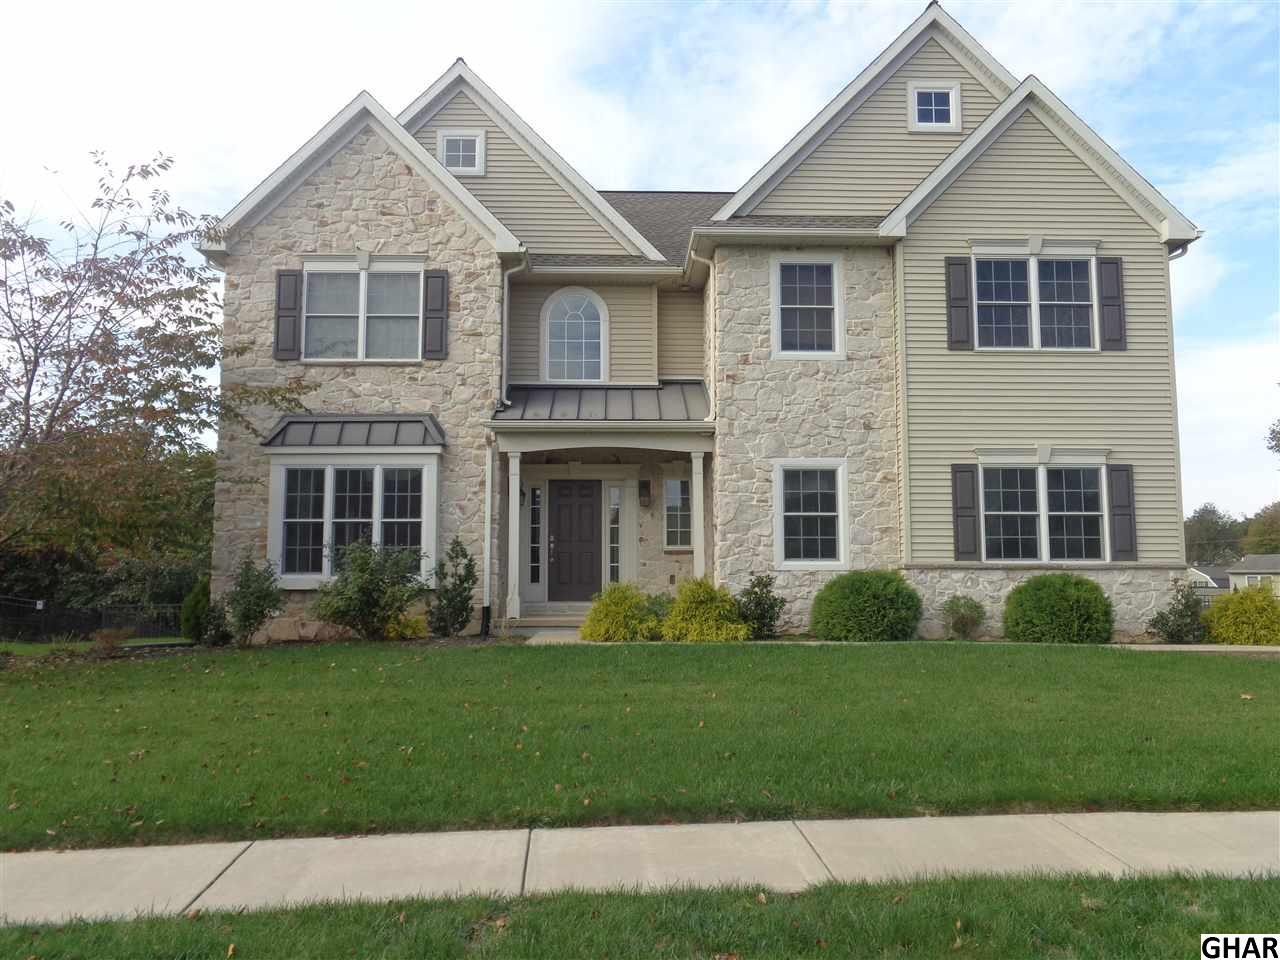 Rental Homes for Rent, ListingId:36139907, location: 729 Hoffman Drive Harrisburg 17111